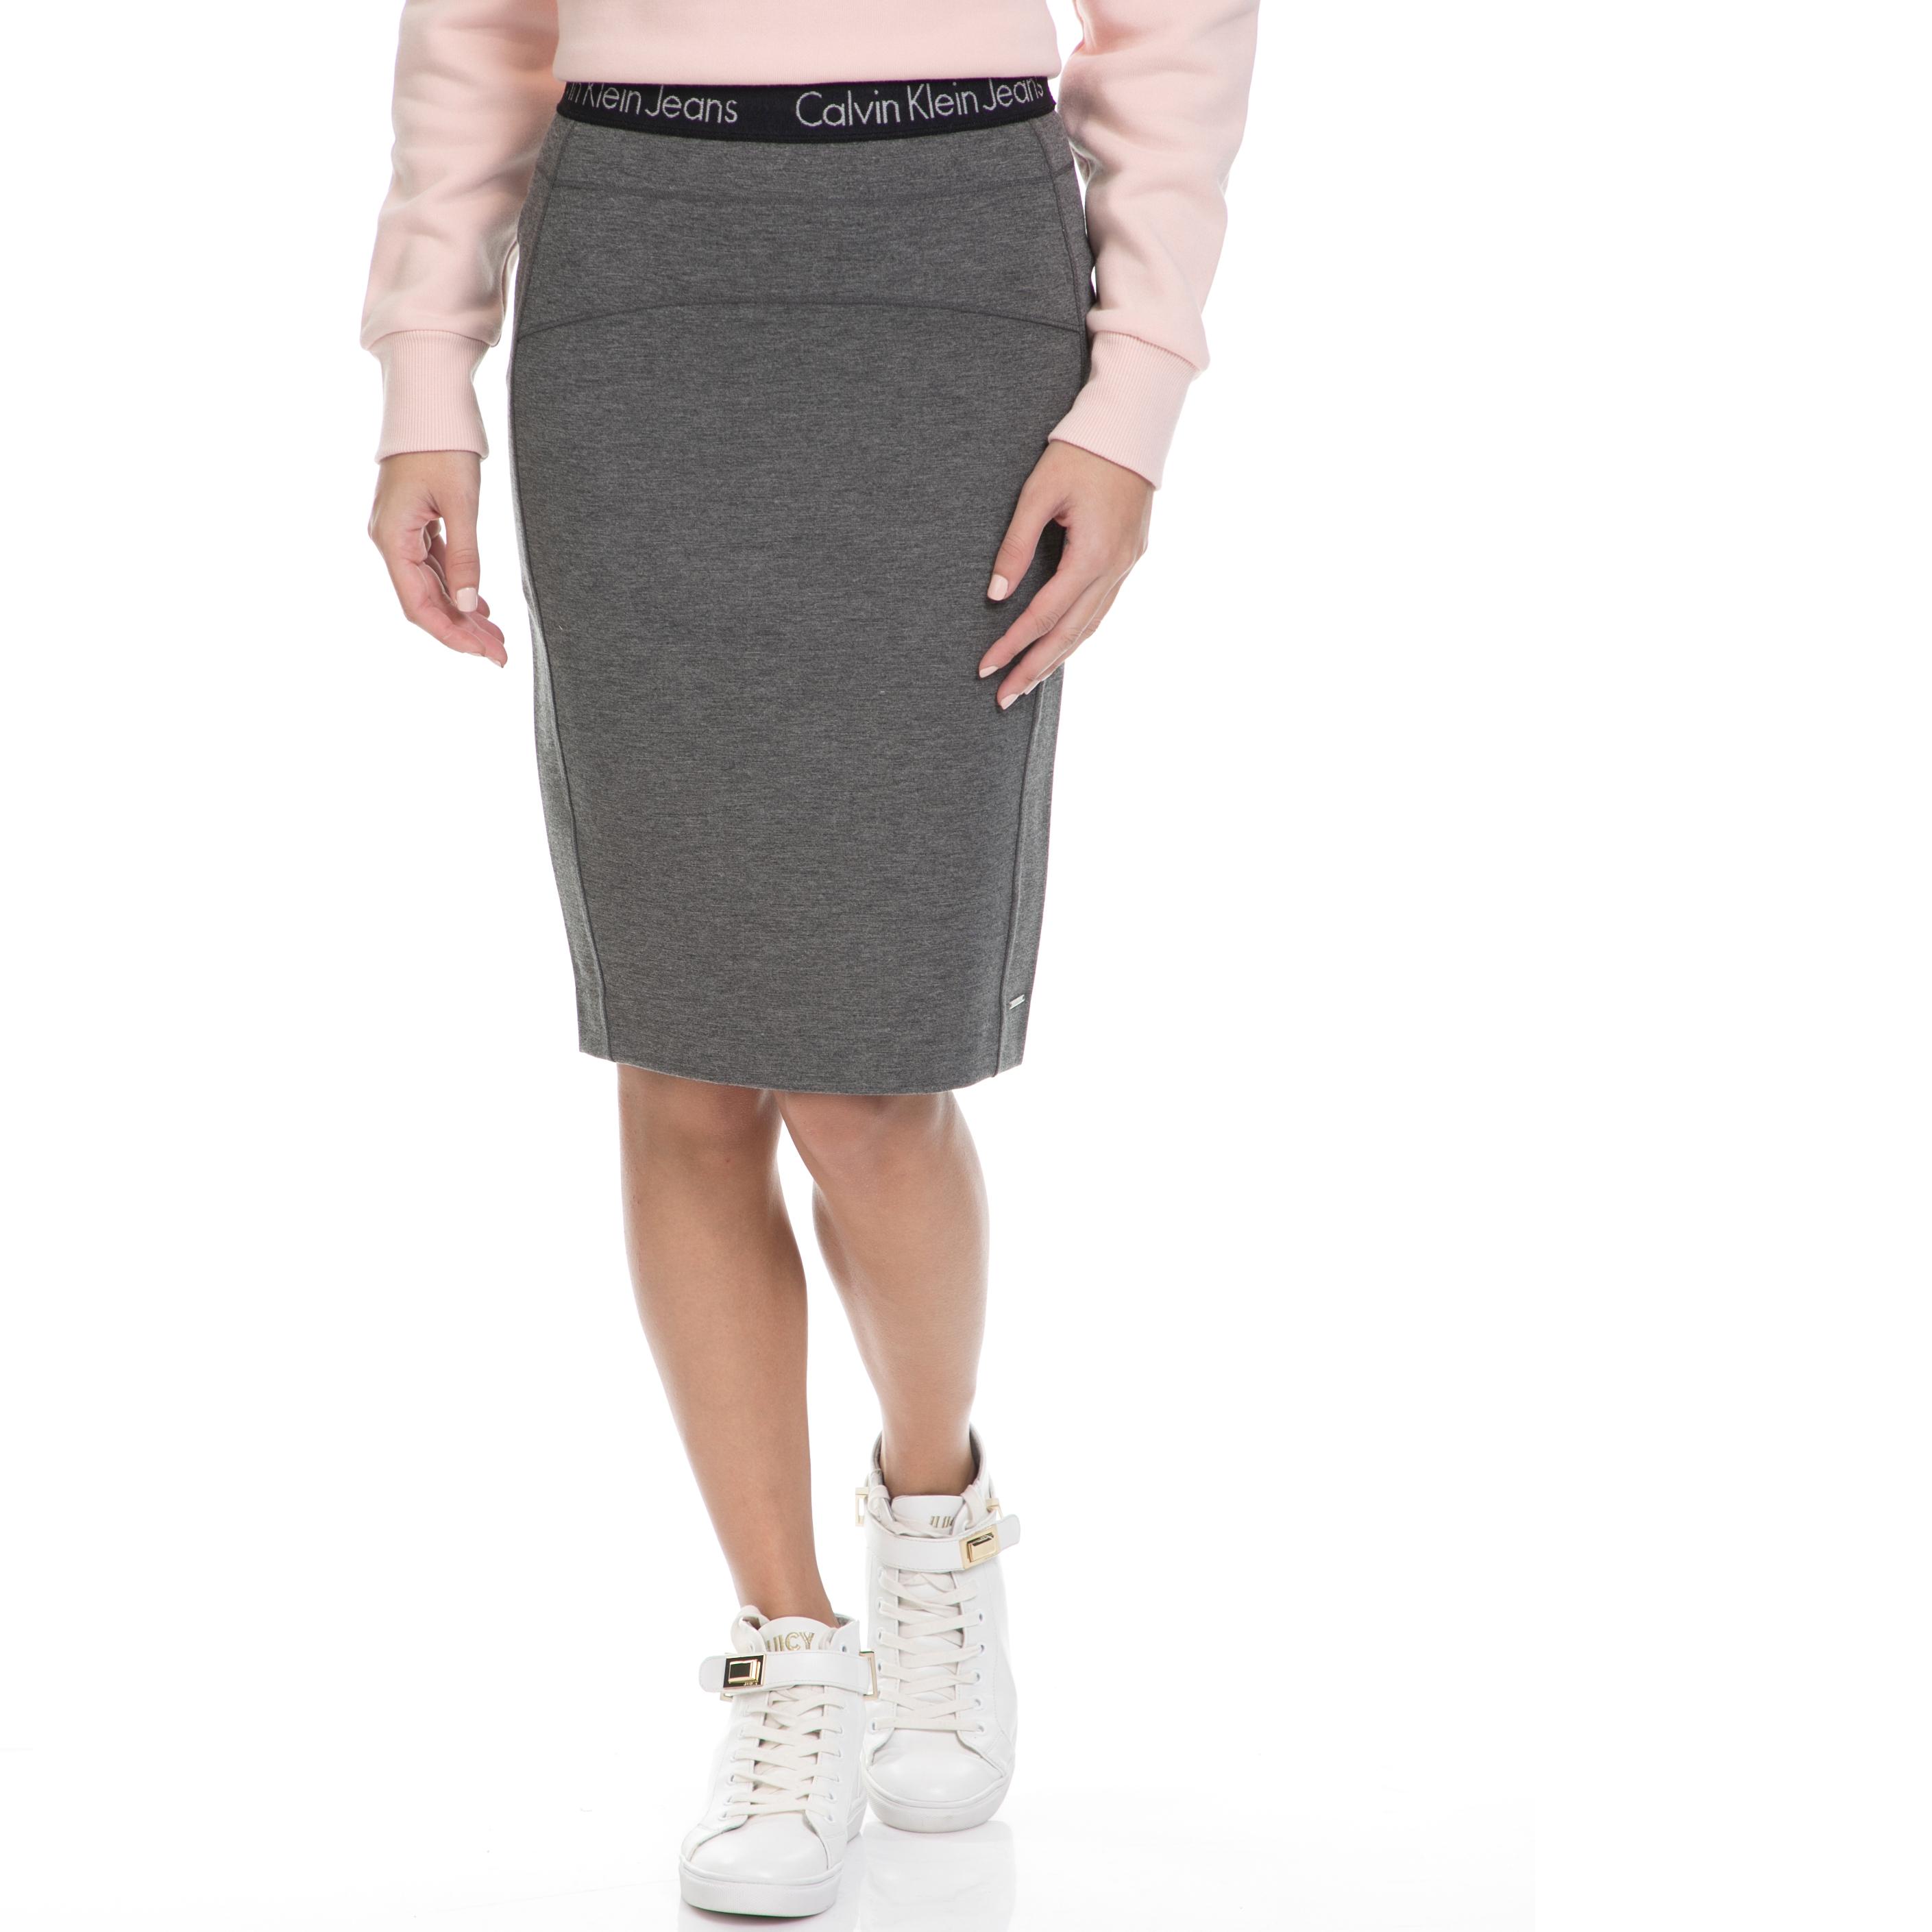 CALVIN KLEIN JEANS – Γυναικεία φούστα KIRI HWK PUNTO γκρι